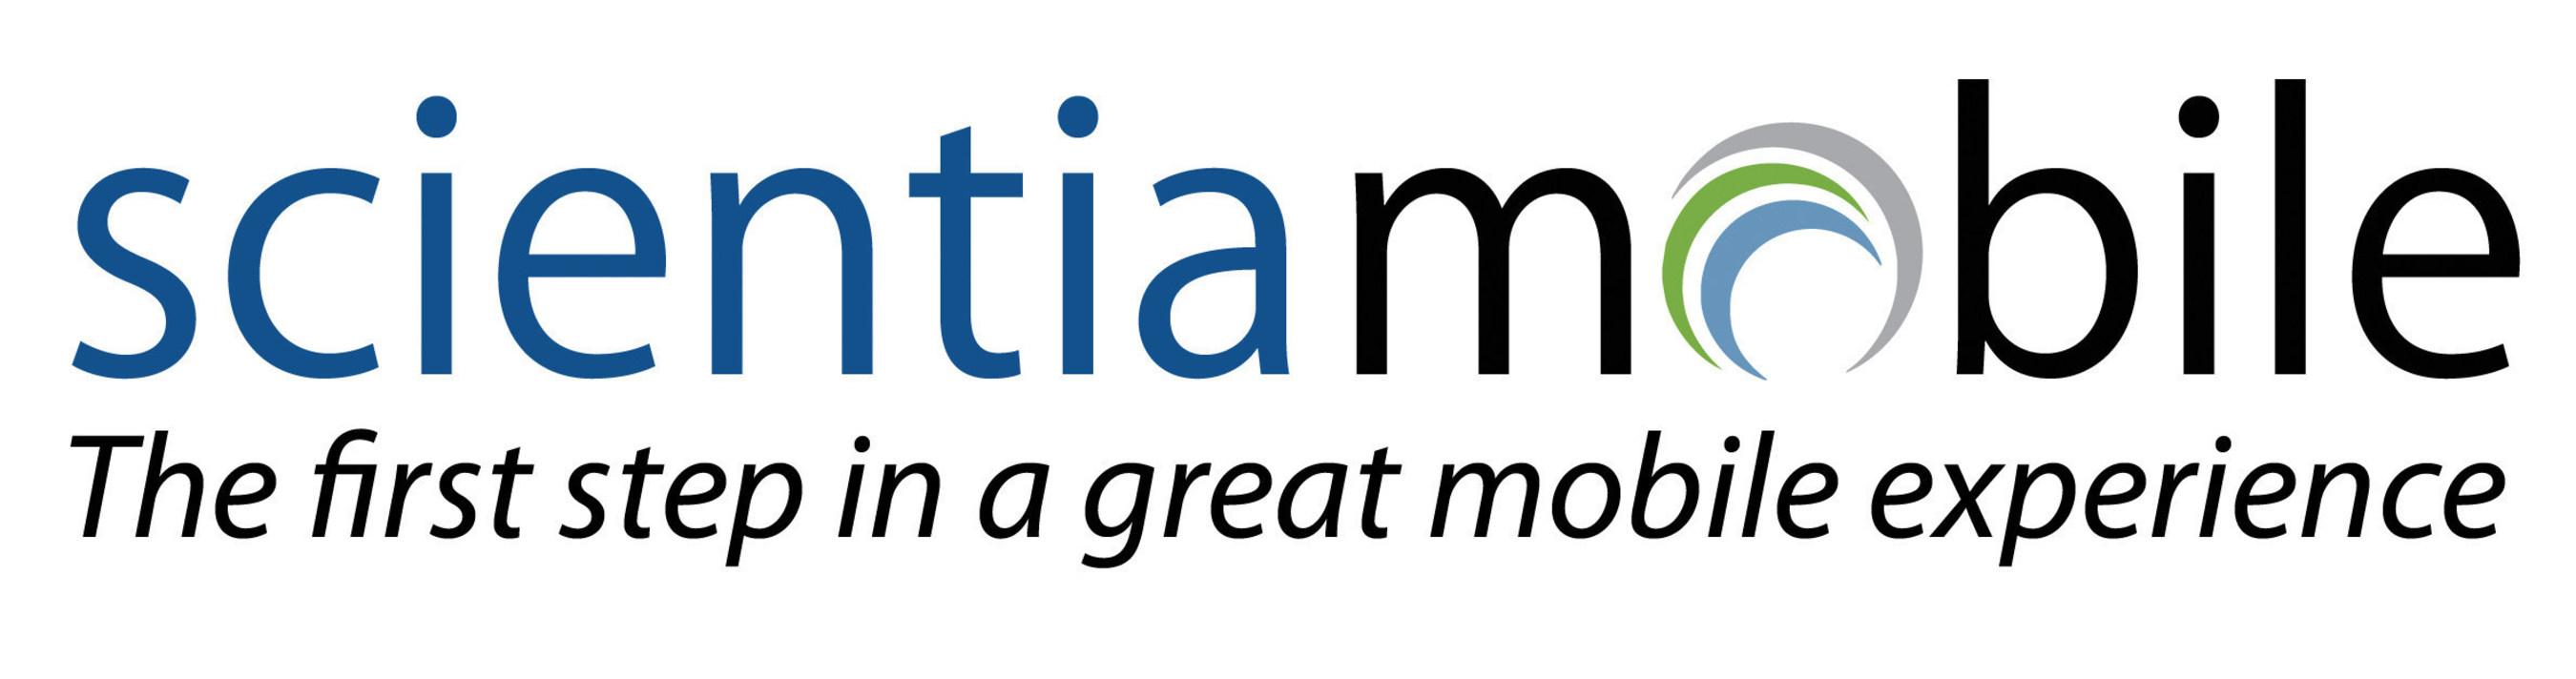 ScientiaMobile logo (PRNewsFoto/ScientiaMobile)